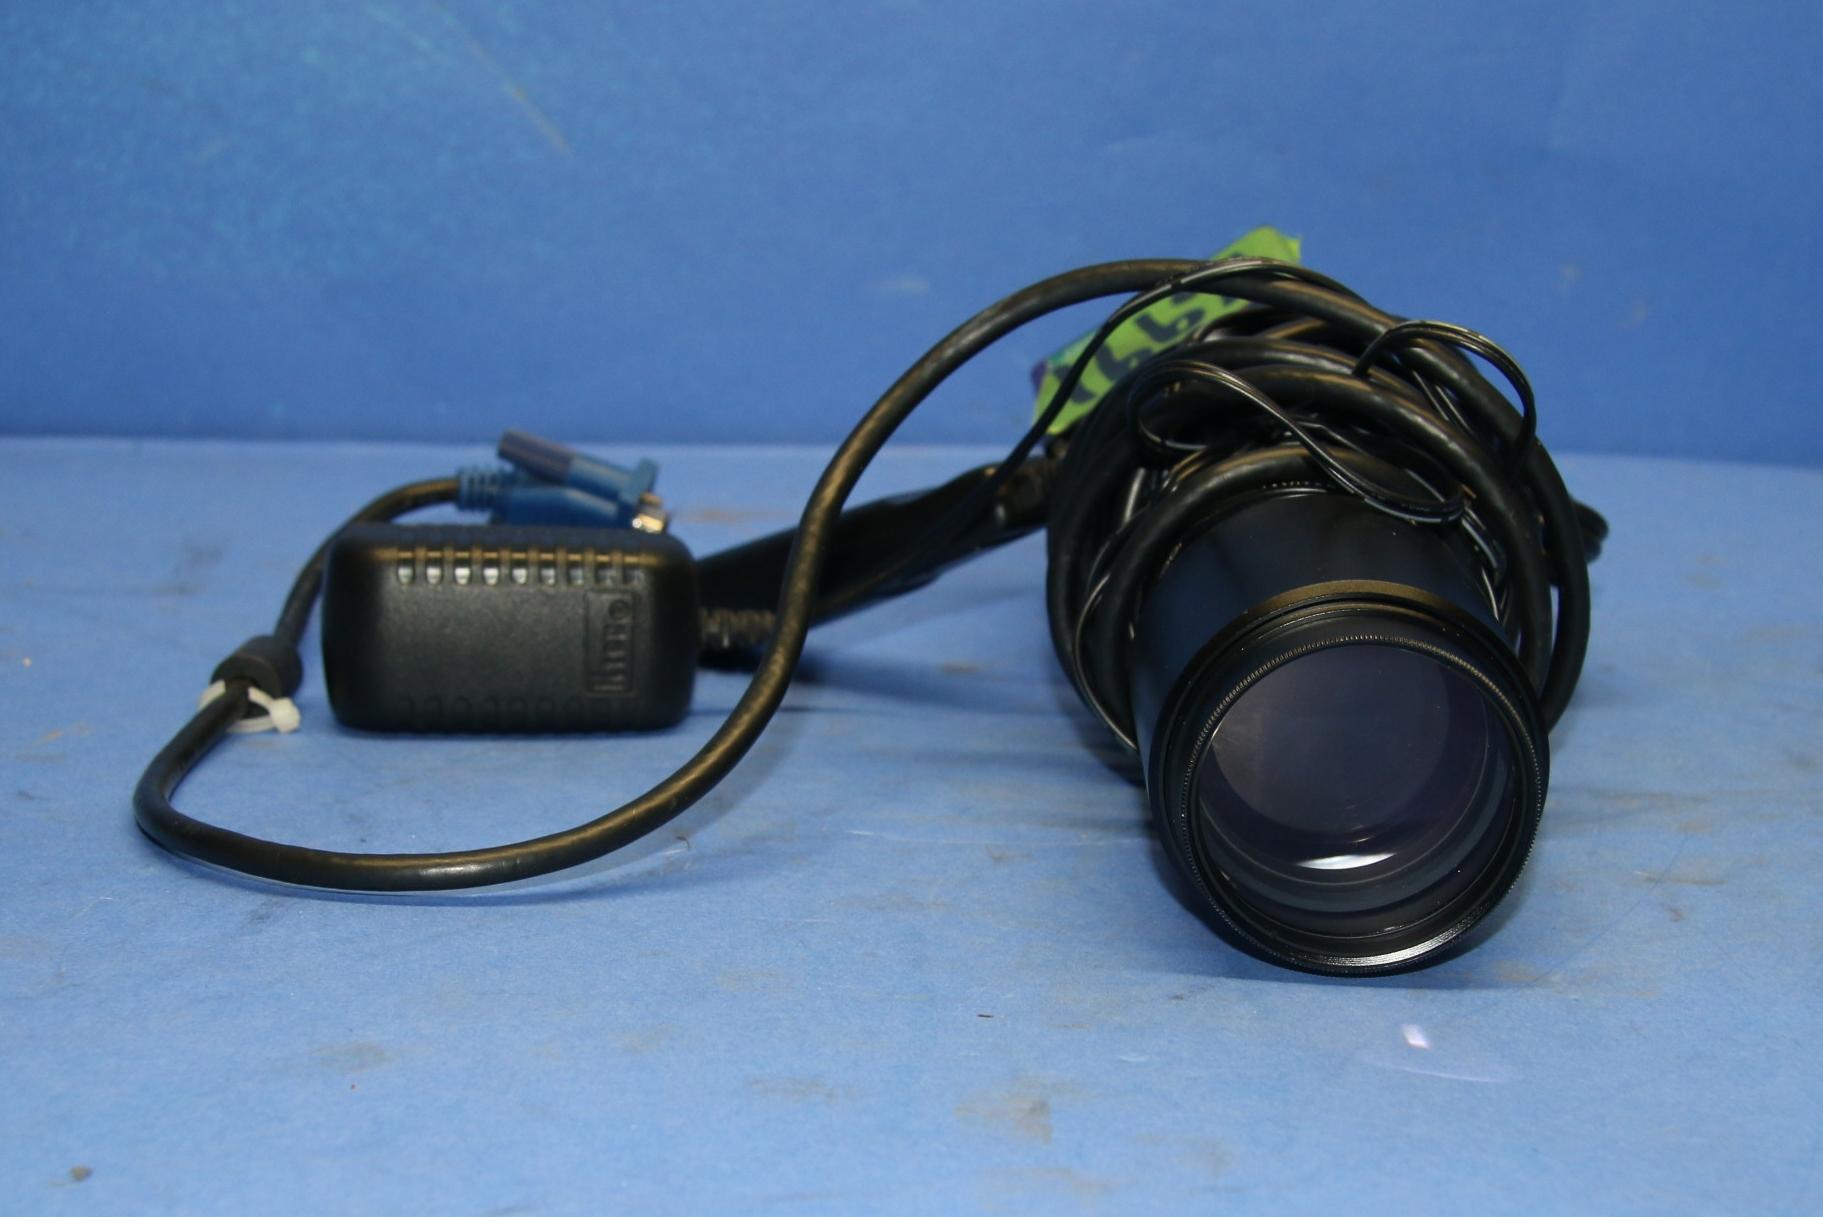 (1) Used Scinscope Camera (1) Used Navitar 7000 TV 16991